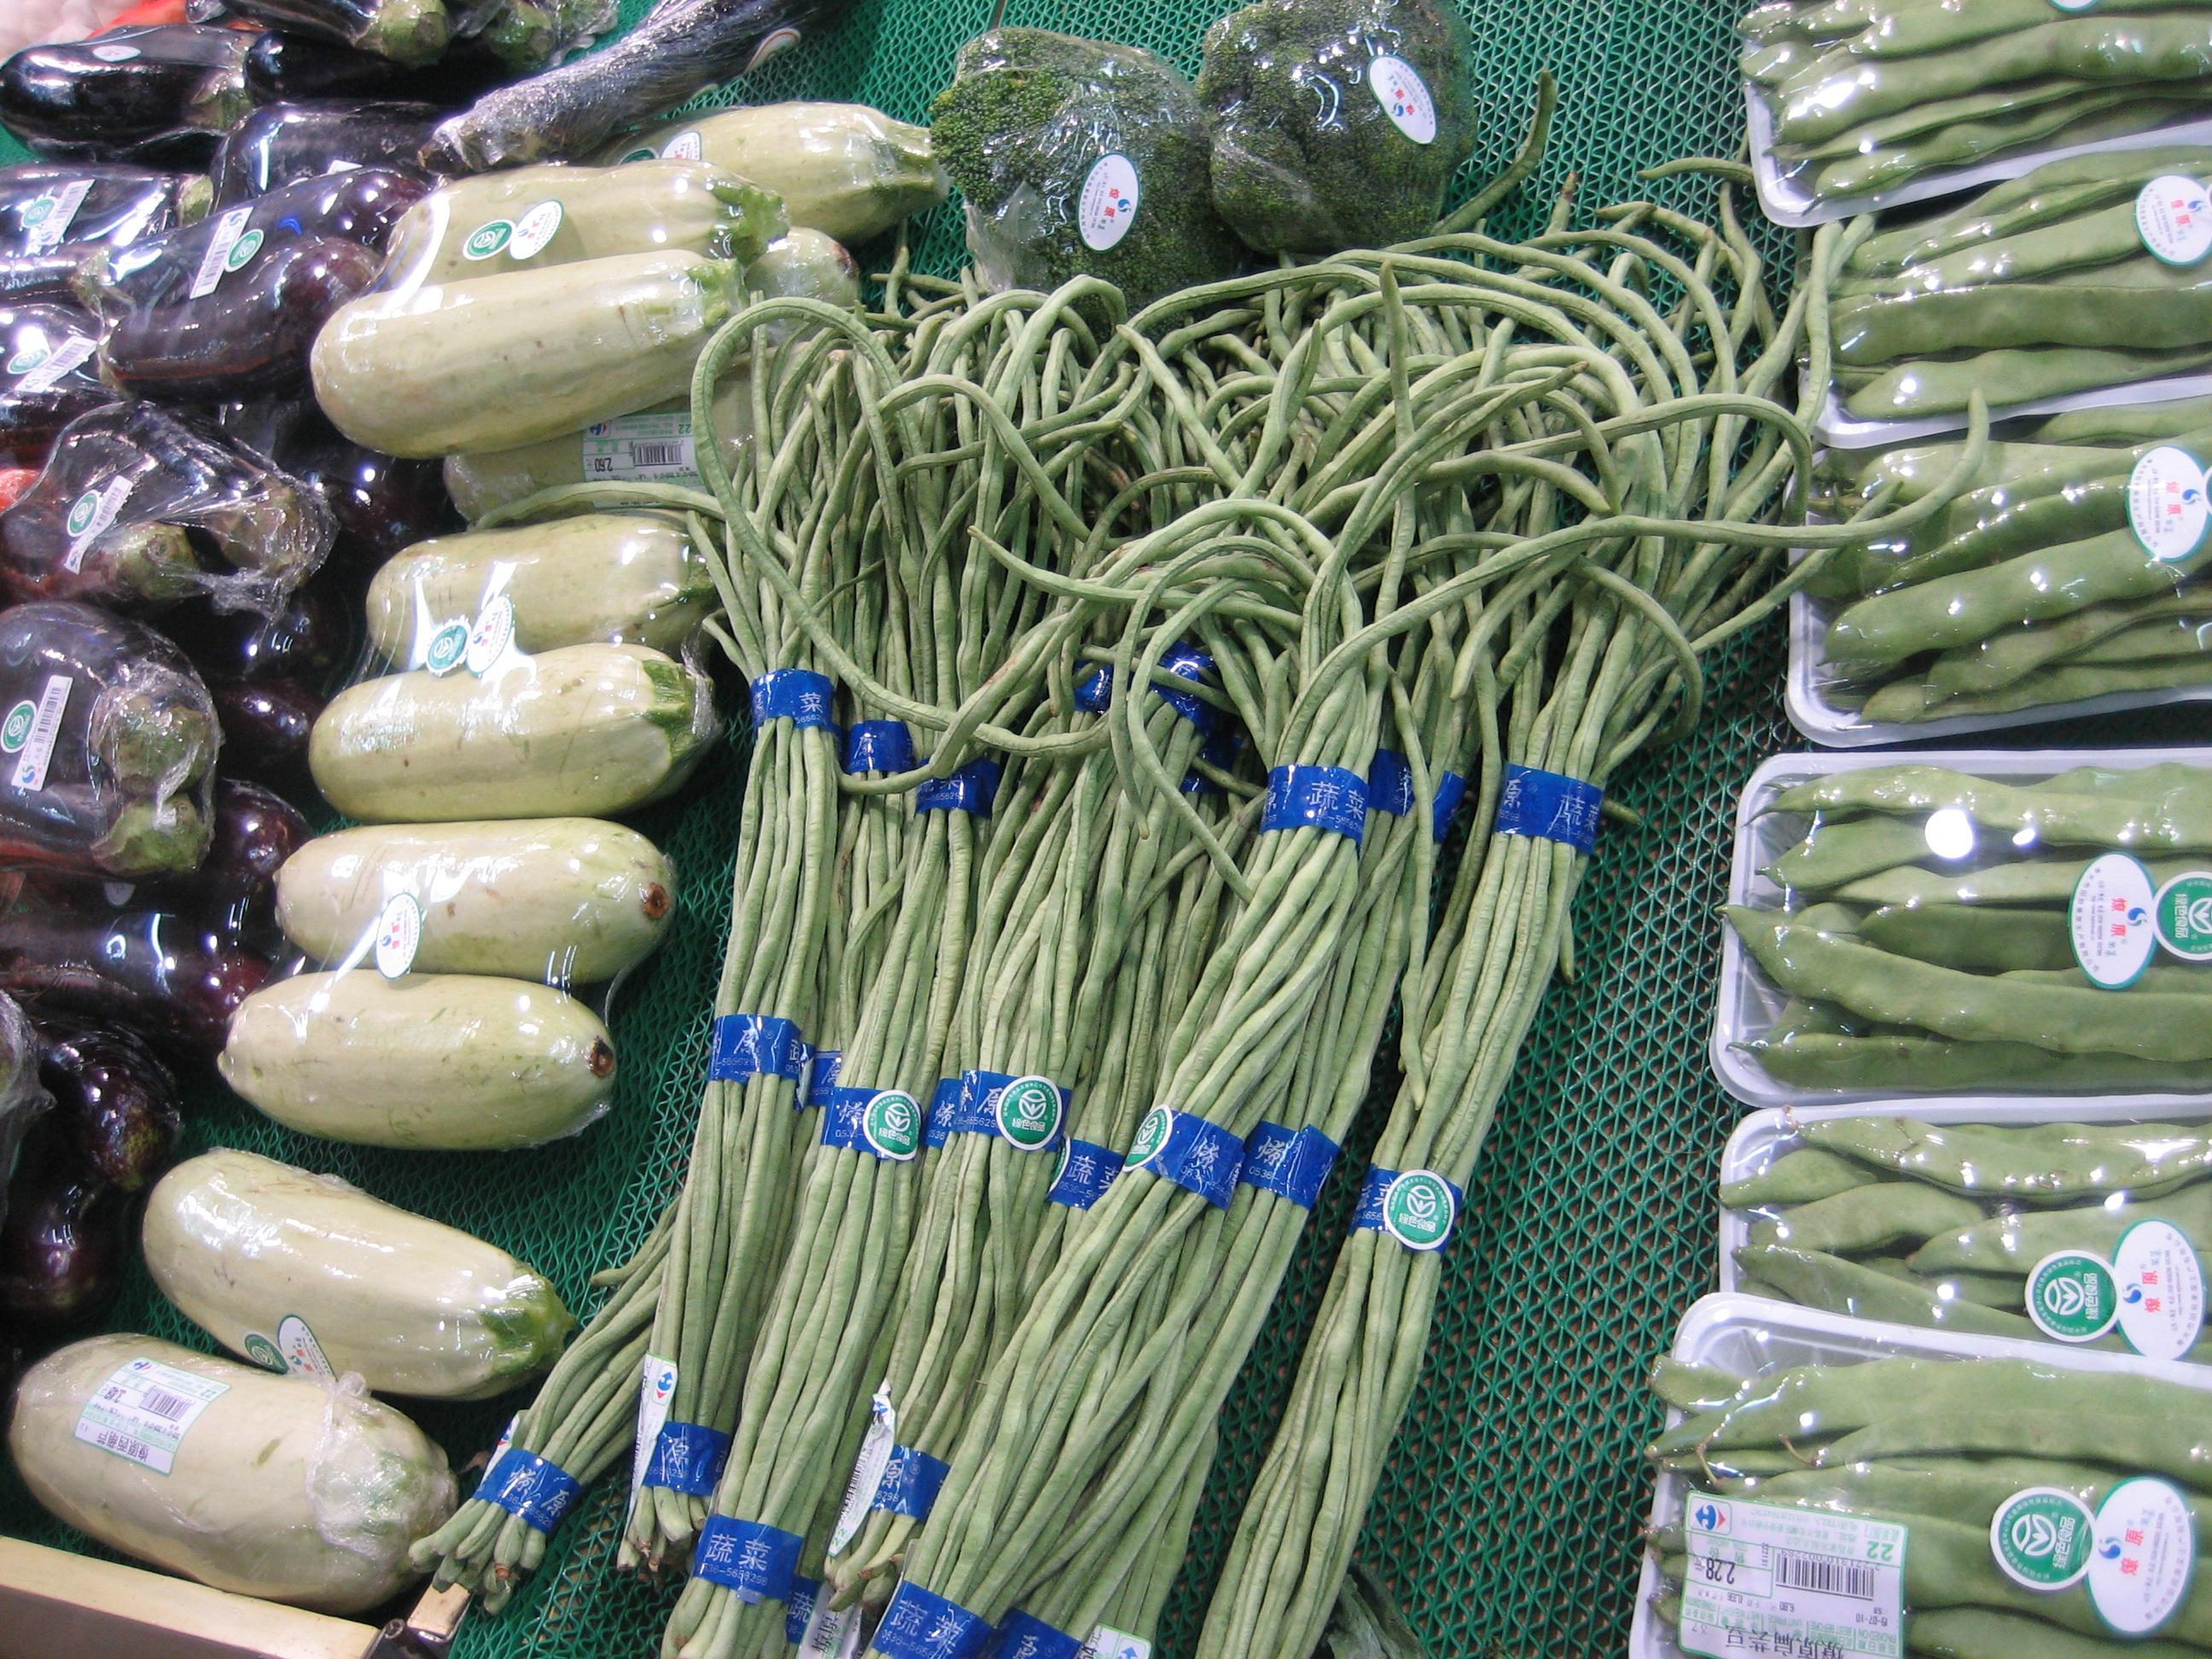 légumes carrefour qingdao chine